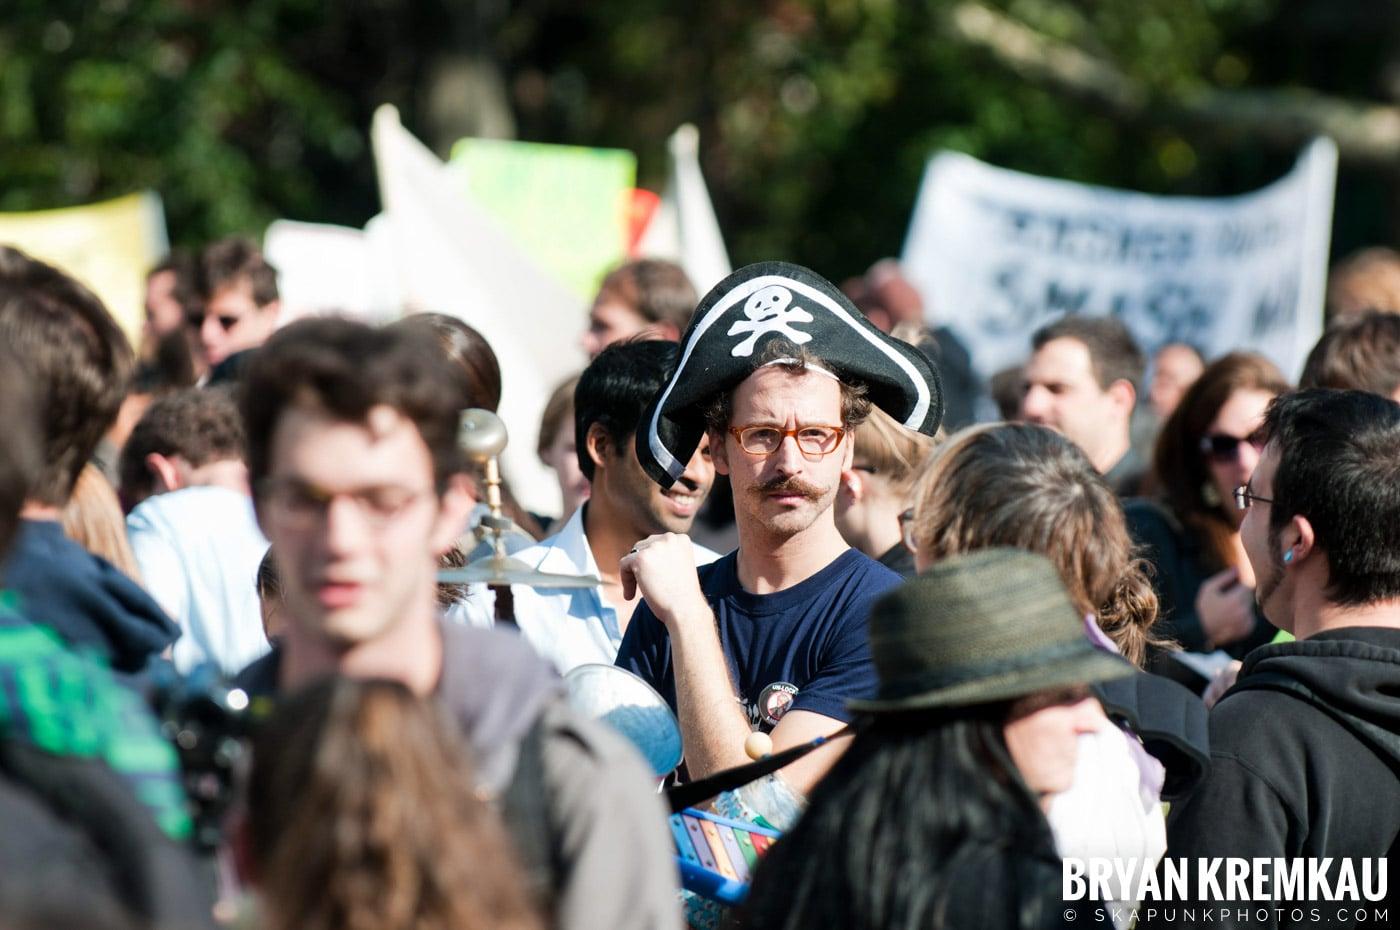 Occupy Wall Street @ Zuccotti Park and Washington Square Park, NYC - 10.15.11 (10)